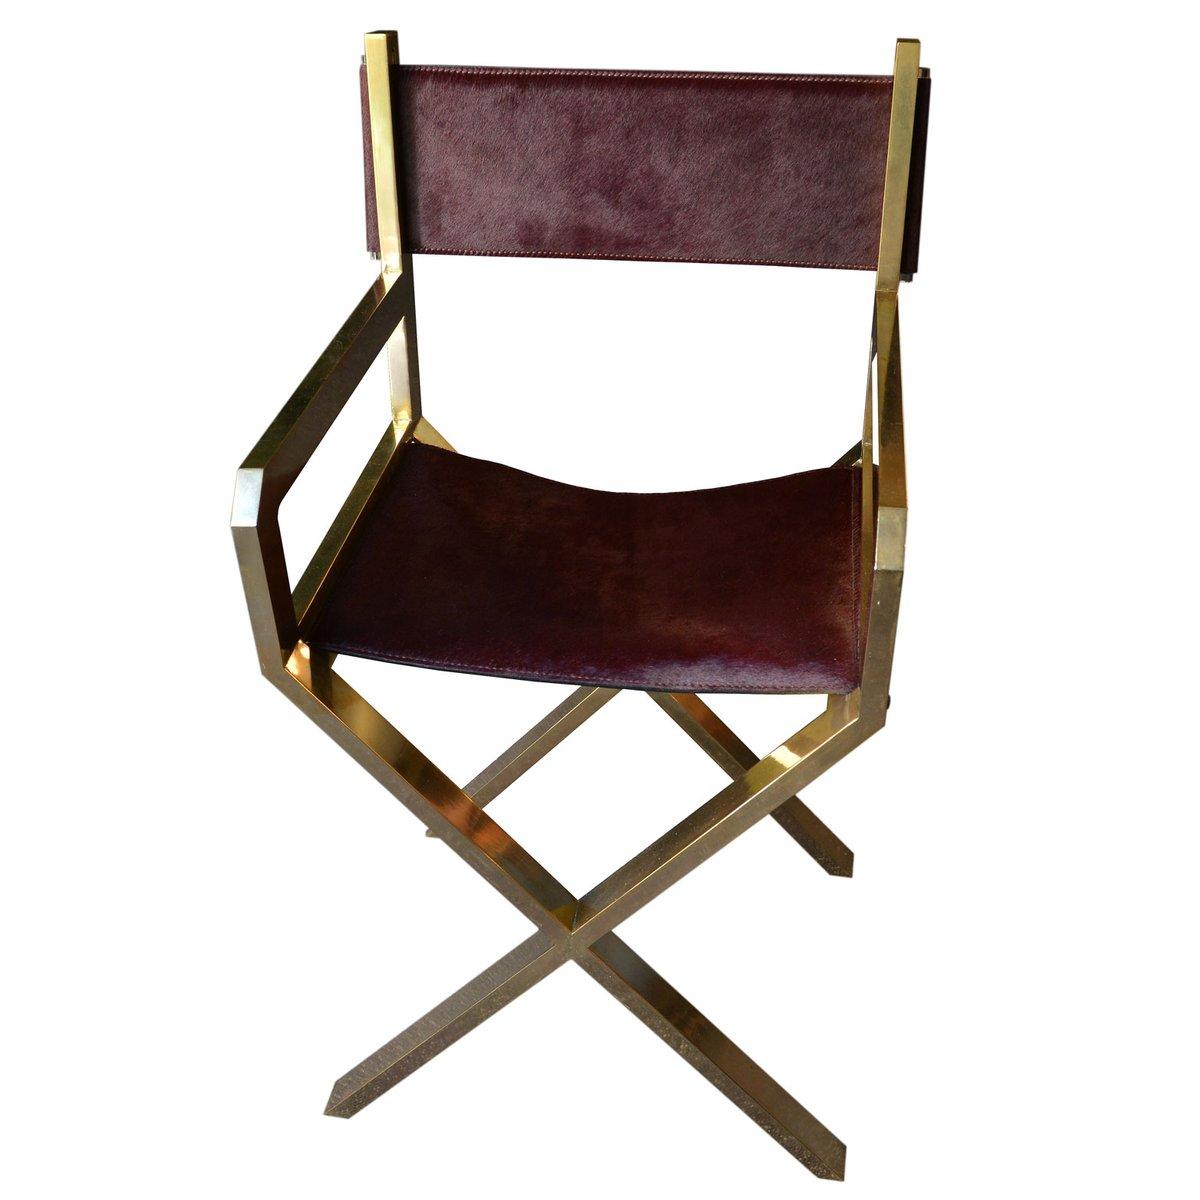 French Brass U0026 Purple Calf Leather Directoru0027s Chair, 1970s